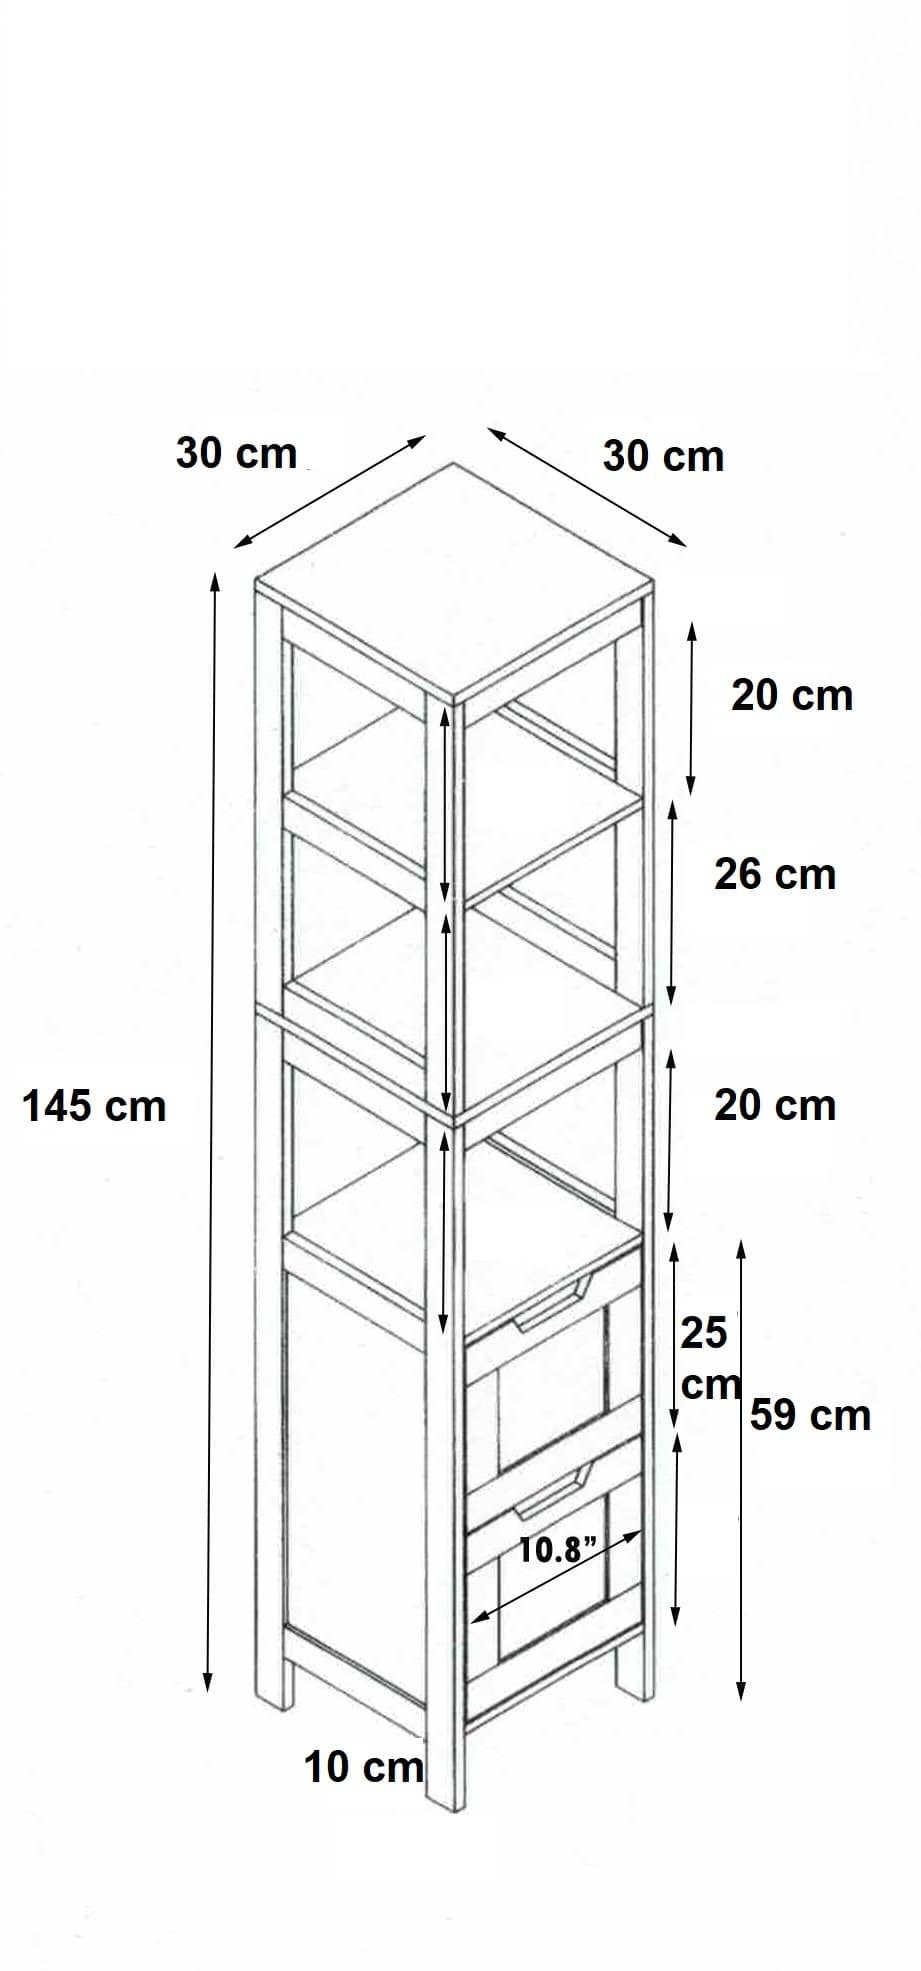 Bamboe Badkamerkast Mahe 2 lades en 3 legplanken 30x30x145 cm - Bruin